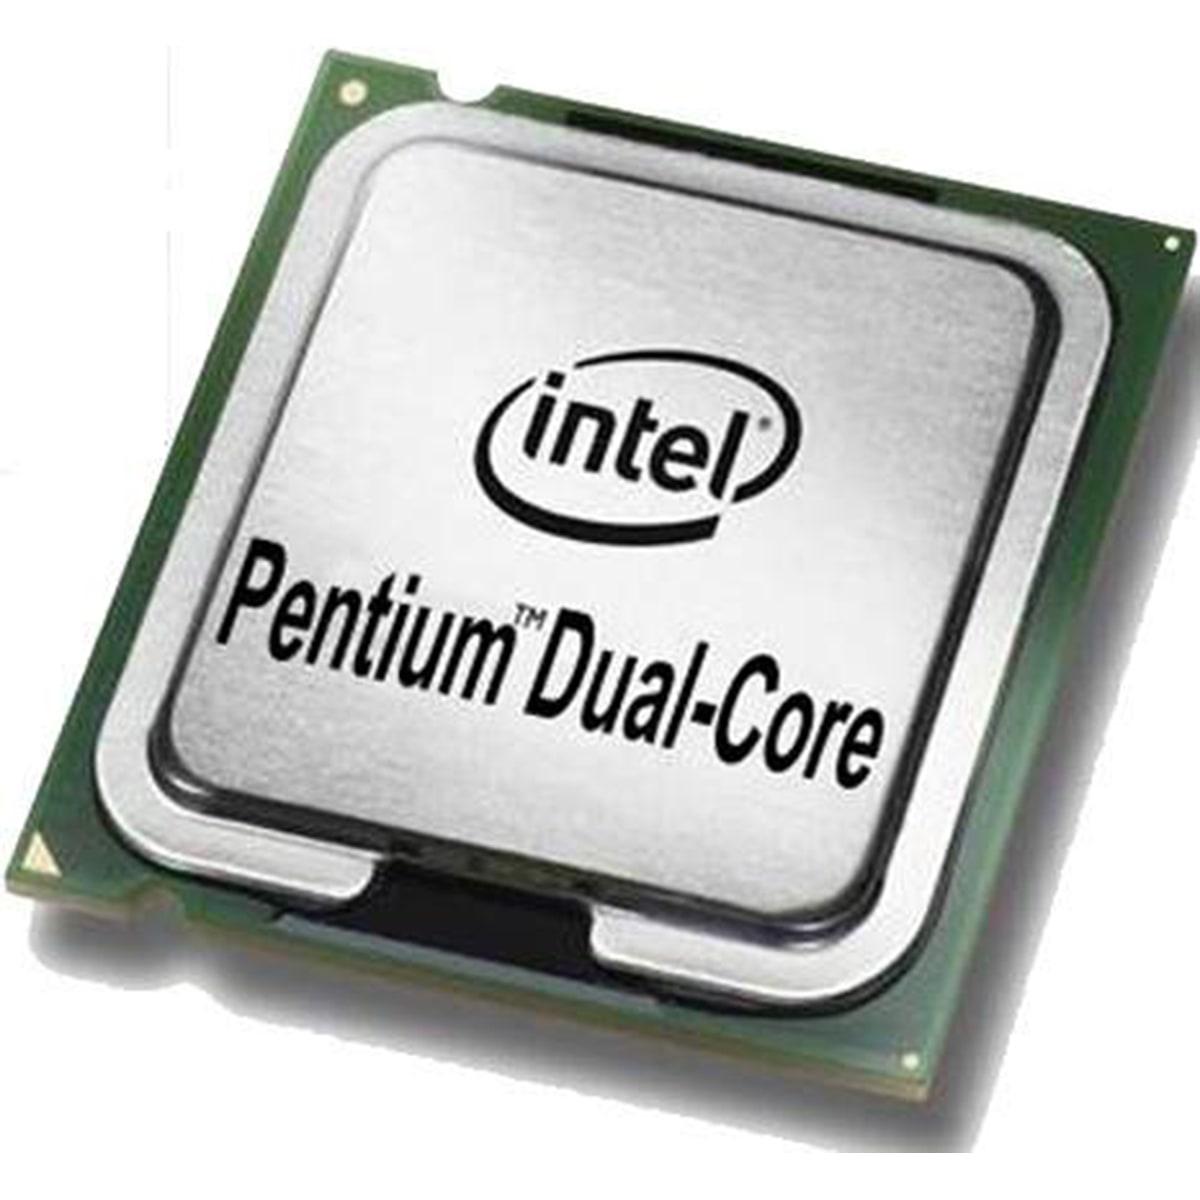 Processador Intel Dual Core E5200 2,50Ghz 2M Cache 800 MHz Socket 775 - Seminovo